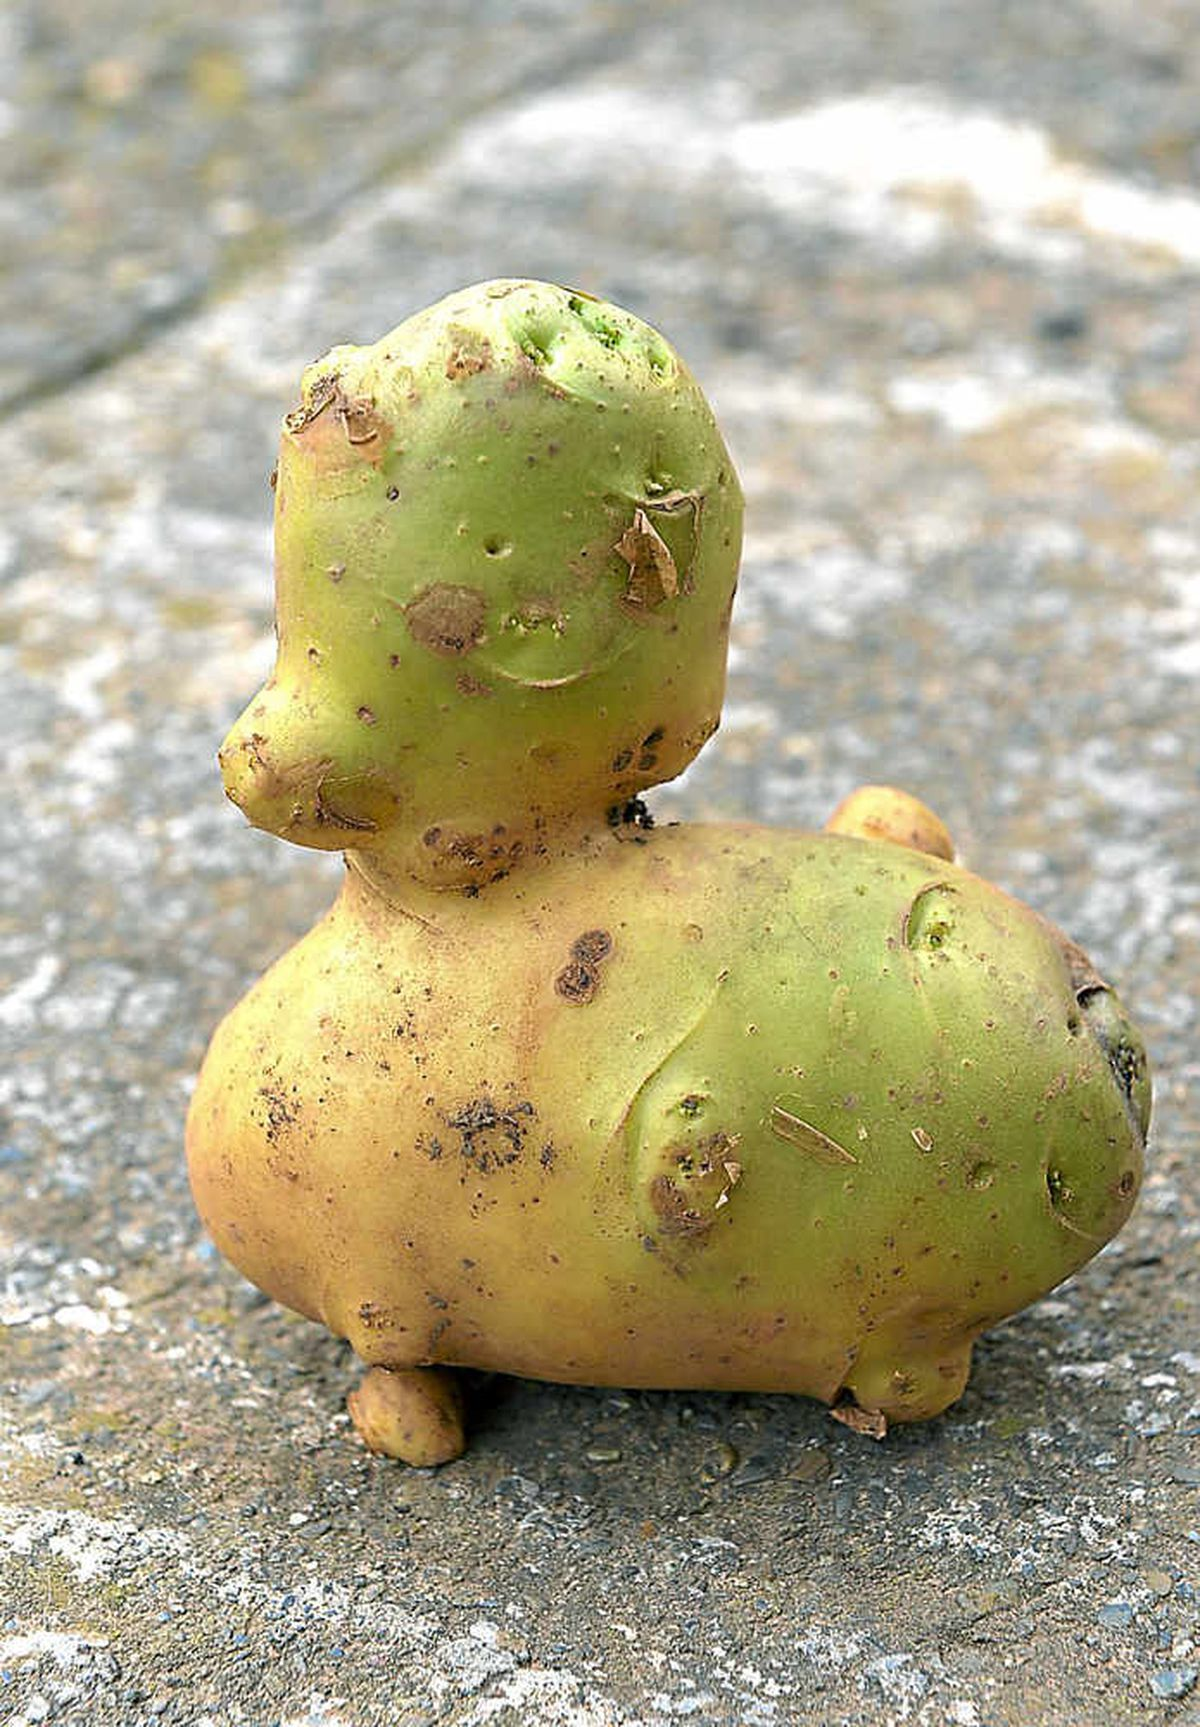 Dorothea Clinton's duck-shaped potato